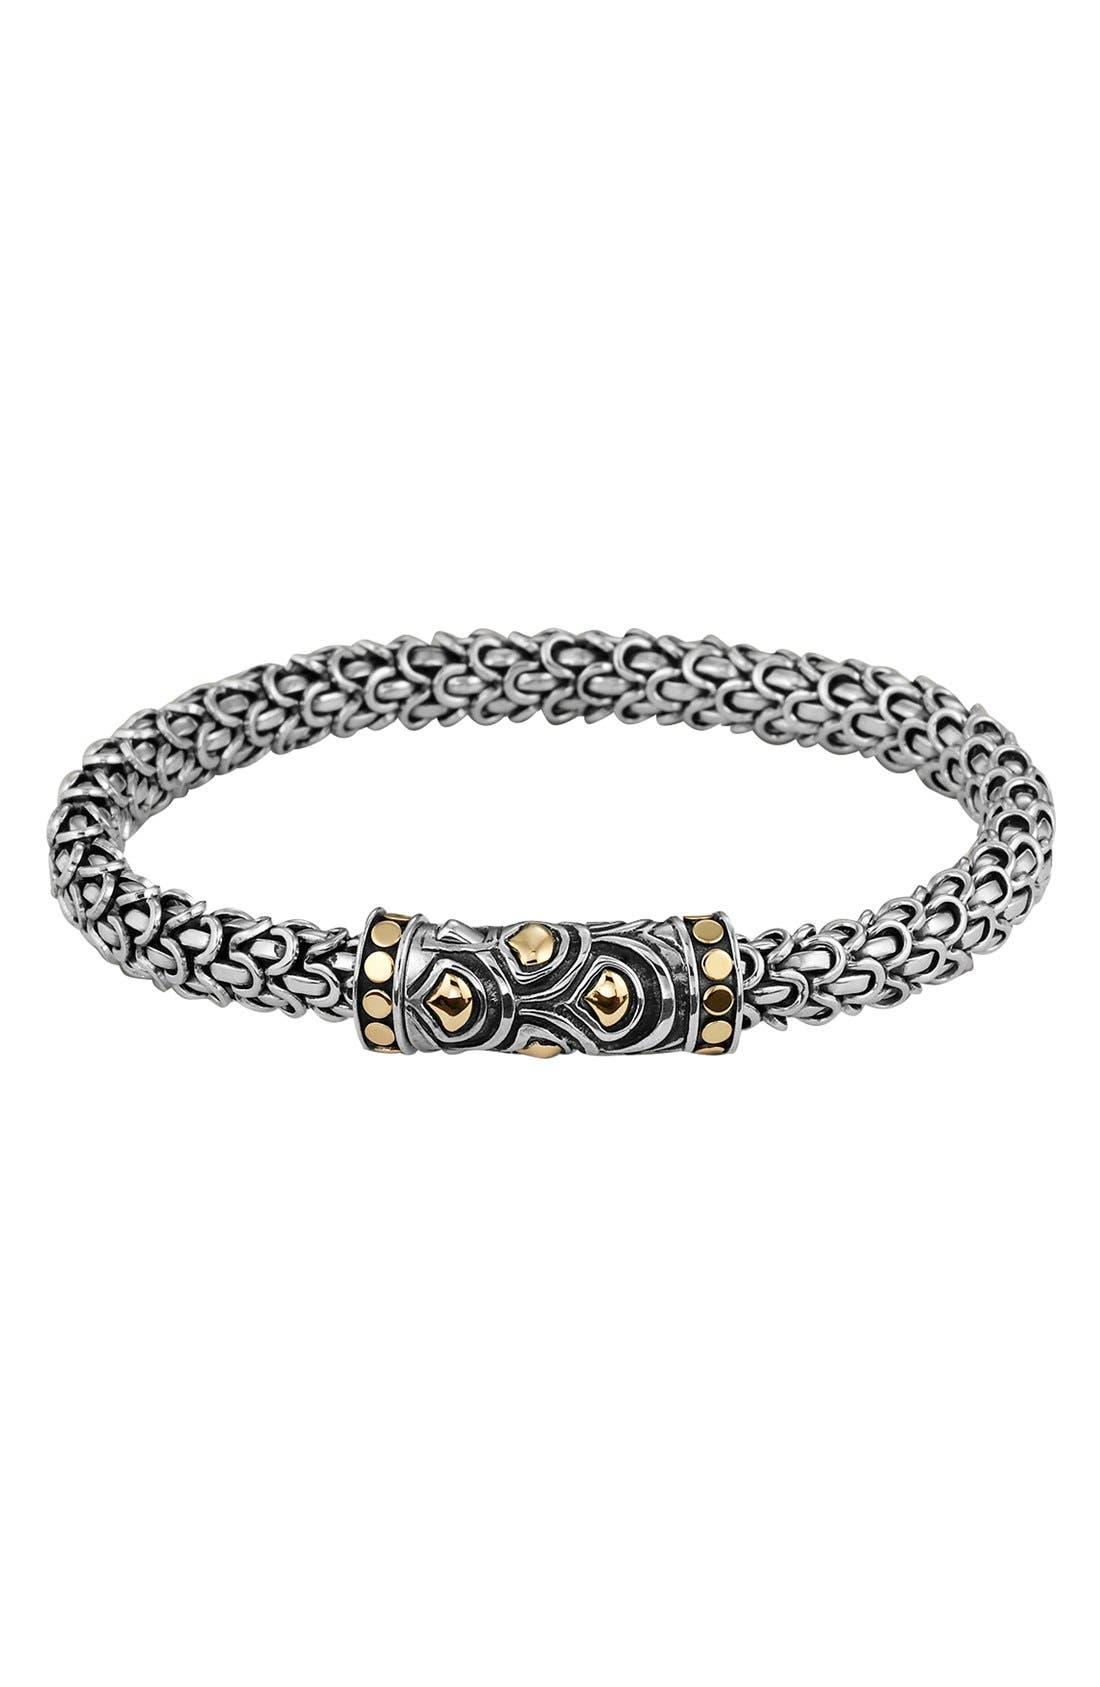 'Naga' Bracelet,                             Main thumbnail 1, color,                             Silver/ Gold